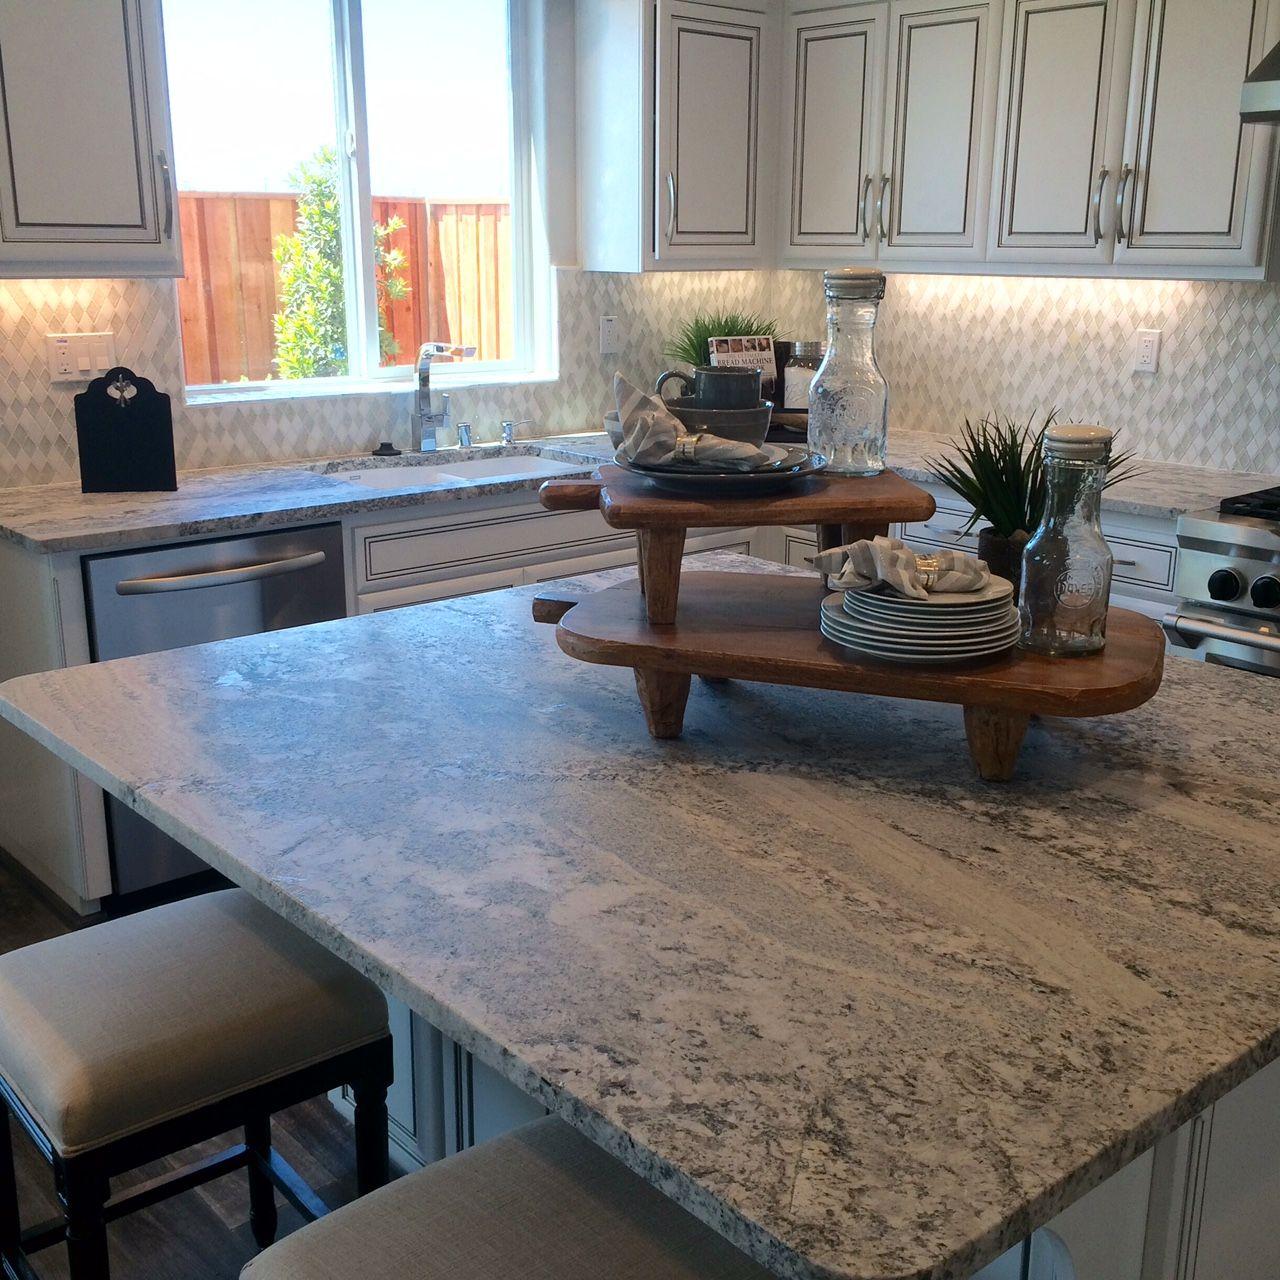 Best Monte Cristo Satin White Cabinets Makes This Kitchen 400 x 300